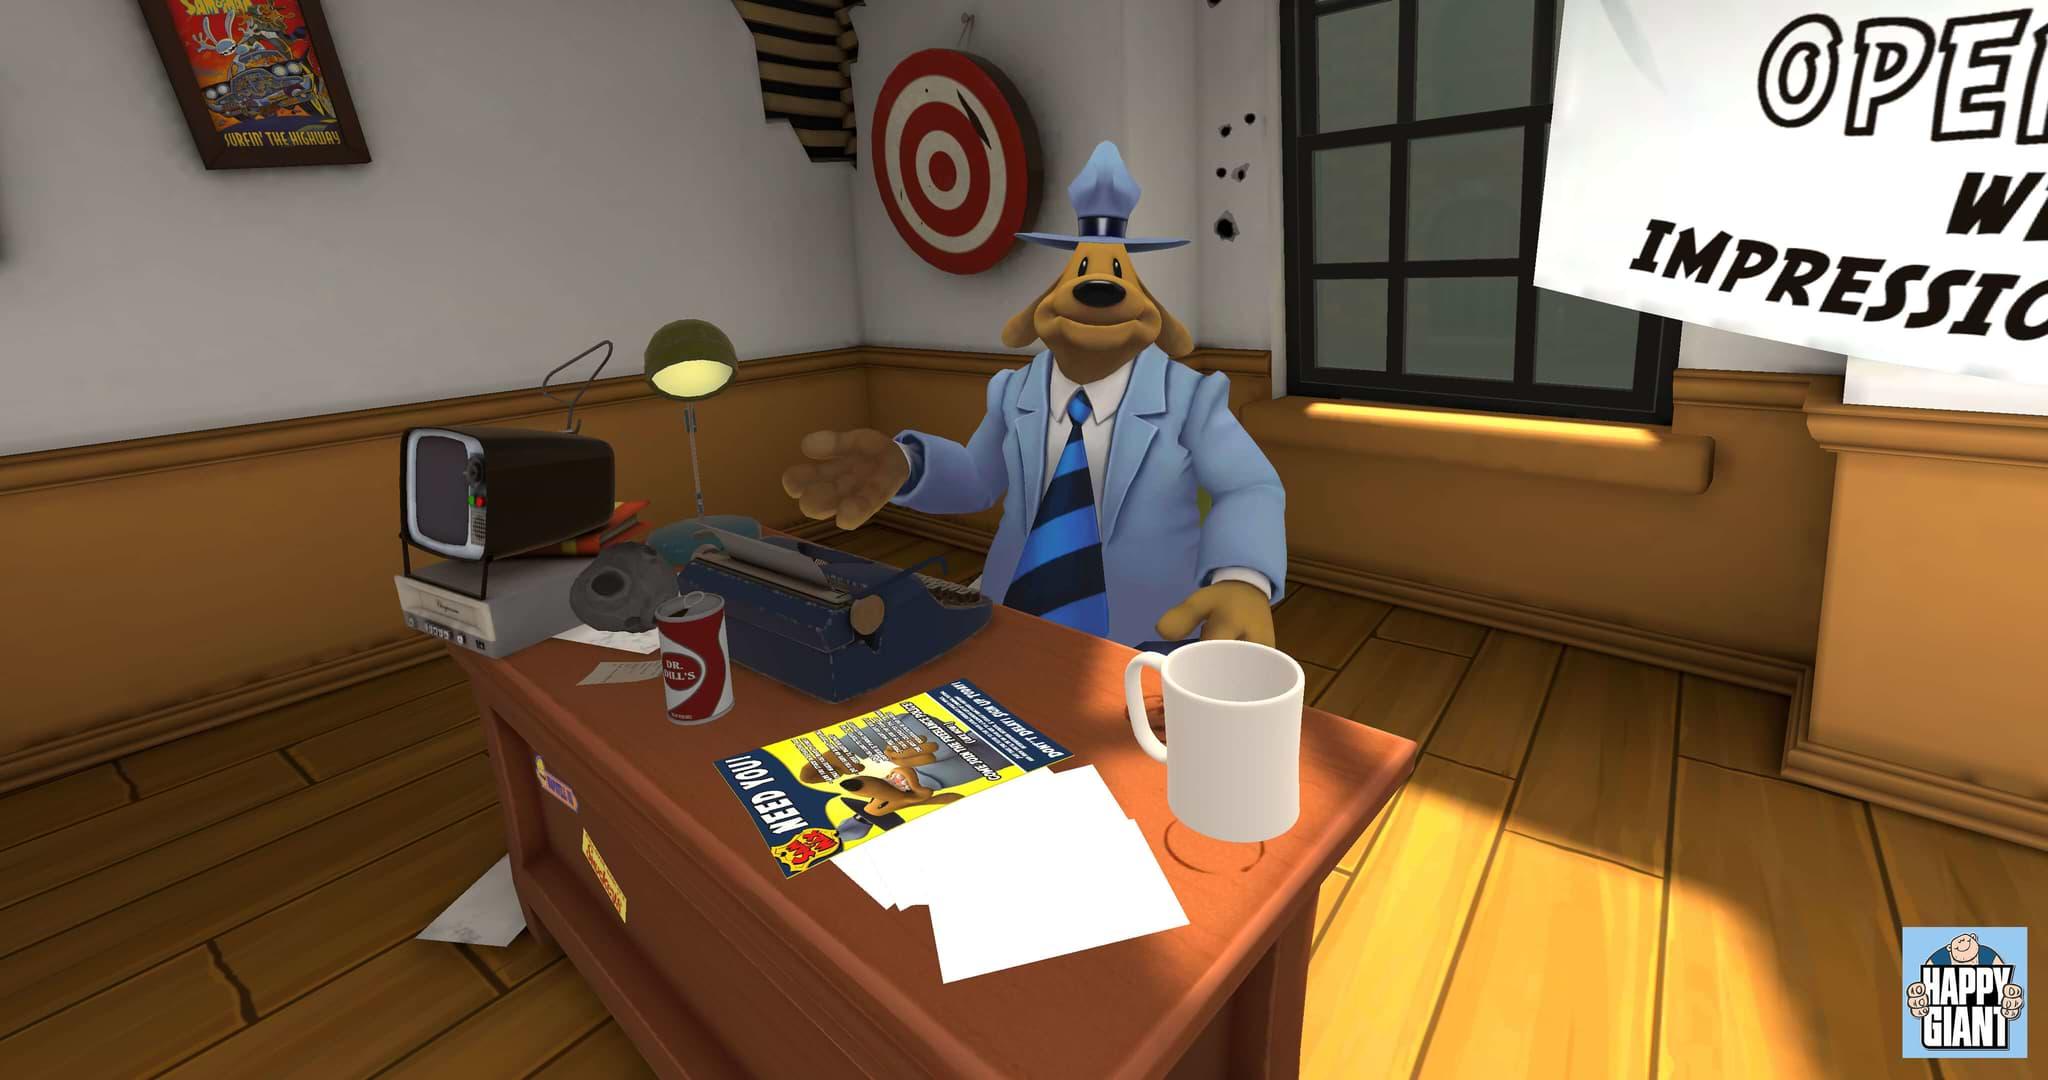 Sam & Max This Time It's Virtual!